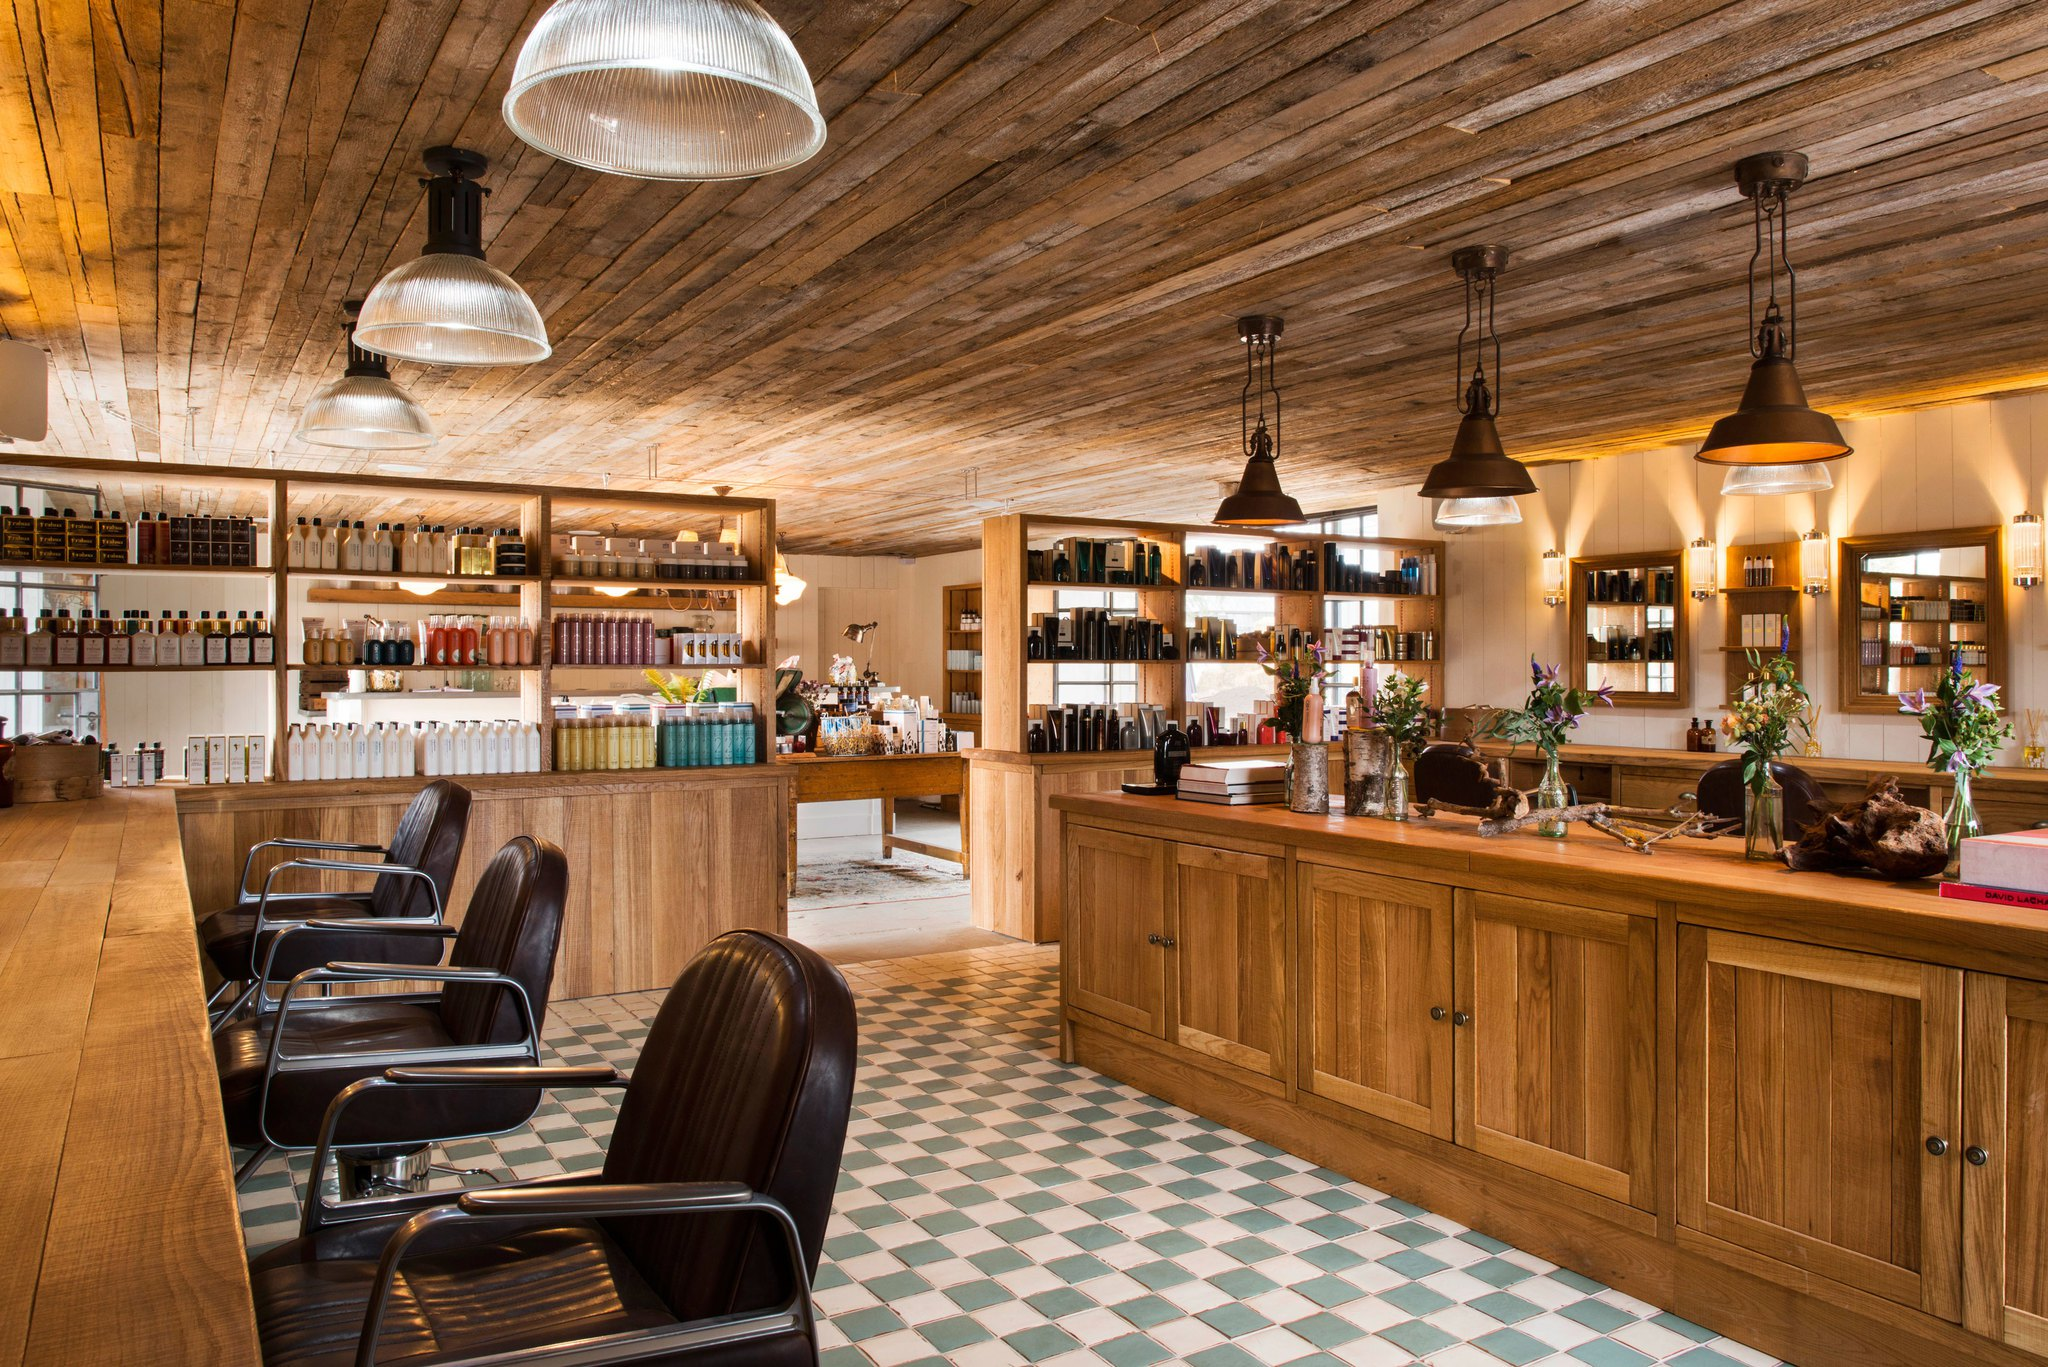 soho-house-farmhouse-2016-boyd-hotel-oxfordshire-9